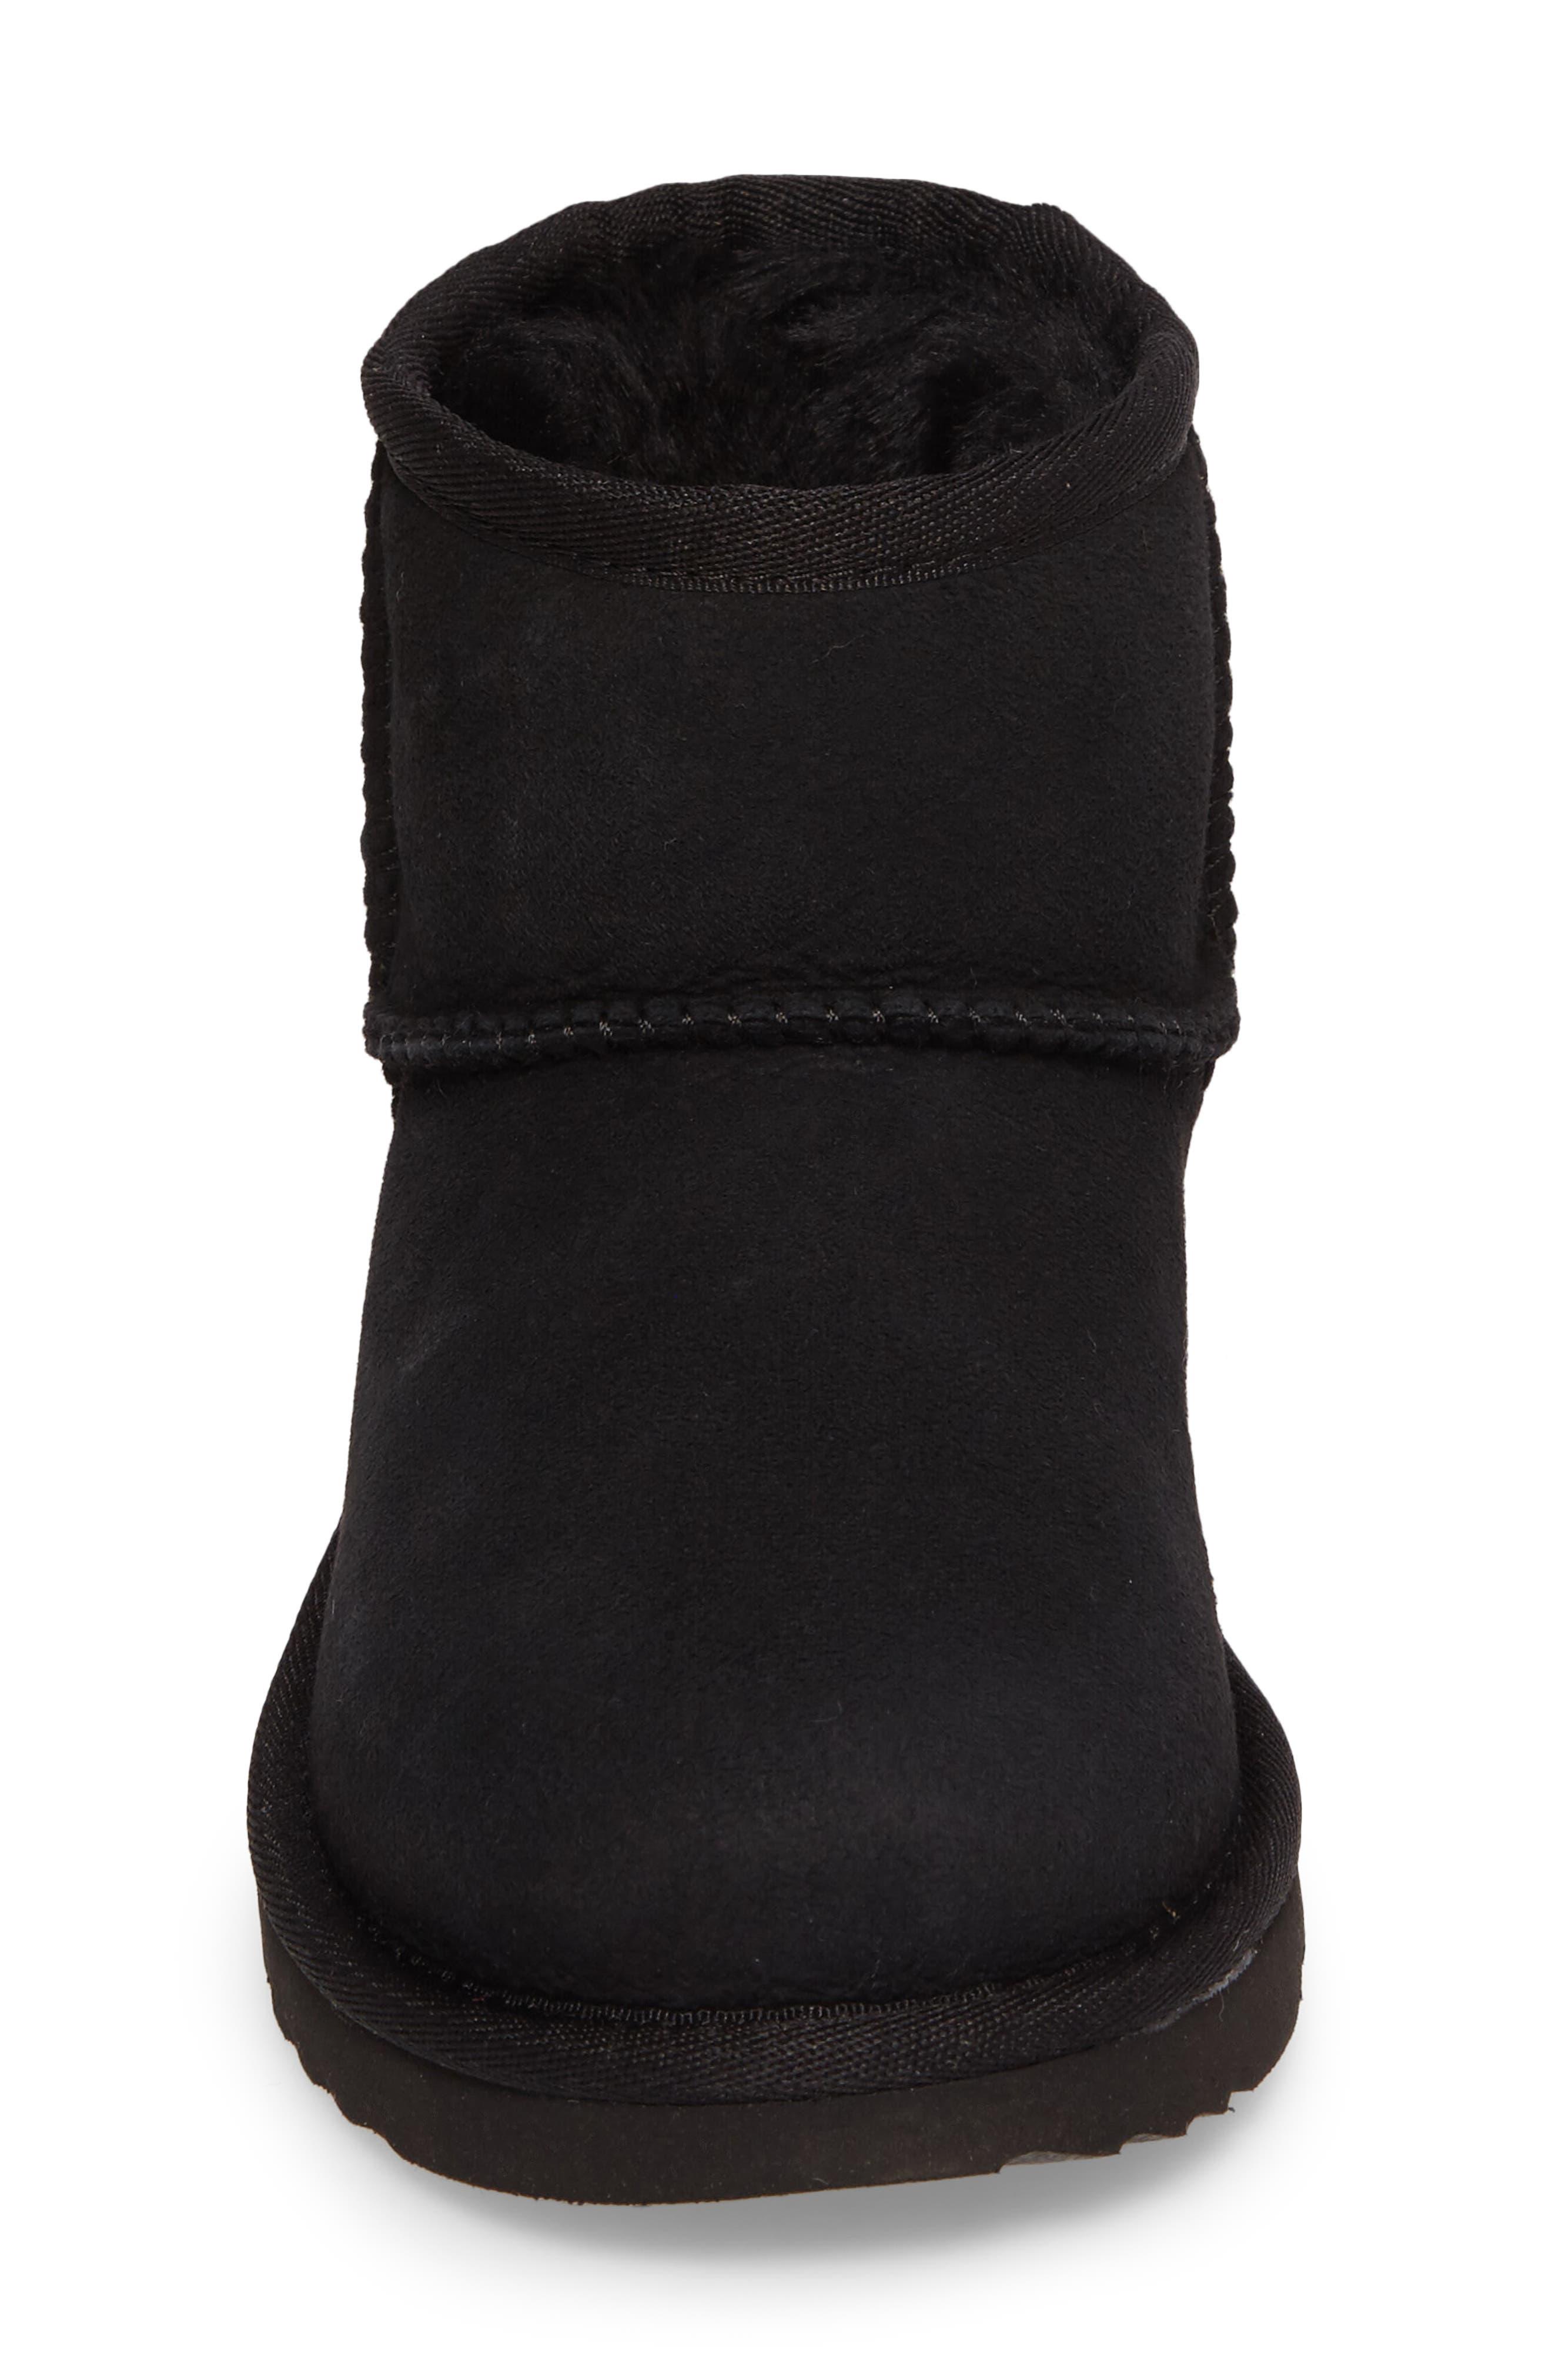 UGG<SUP>®</SUP>, Classic Mini II Water-Resistant Genuine Shearling Boot, Alternate thumbnail 4, color, BLACK